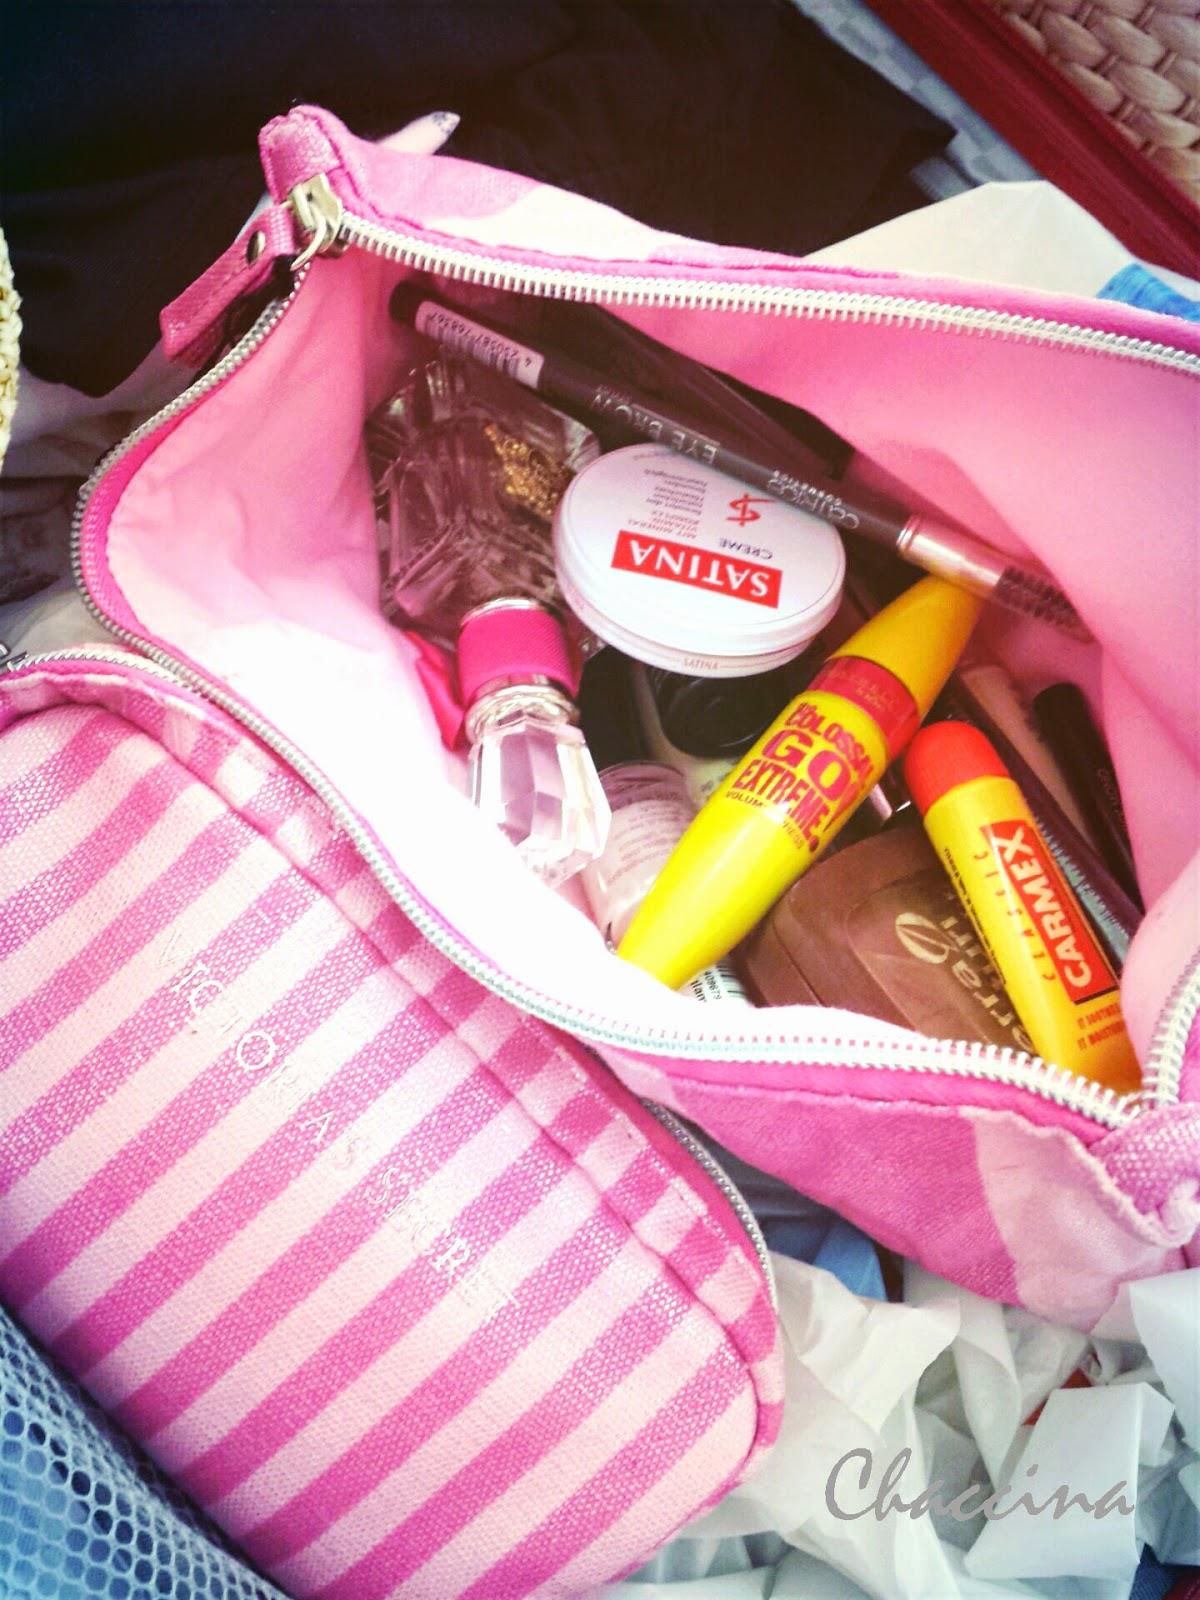 Lifestyleblog Chaccina Kofferpacken